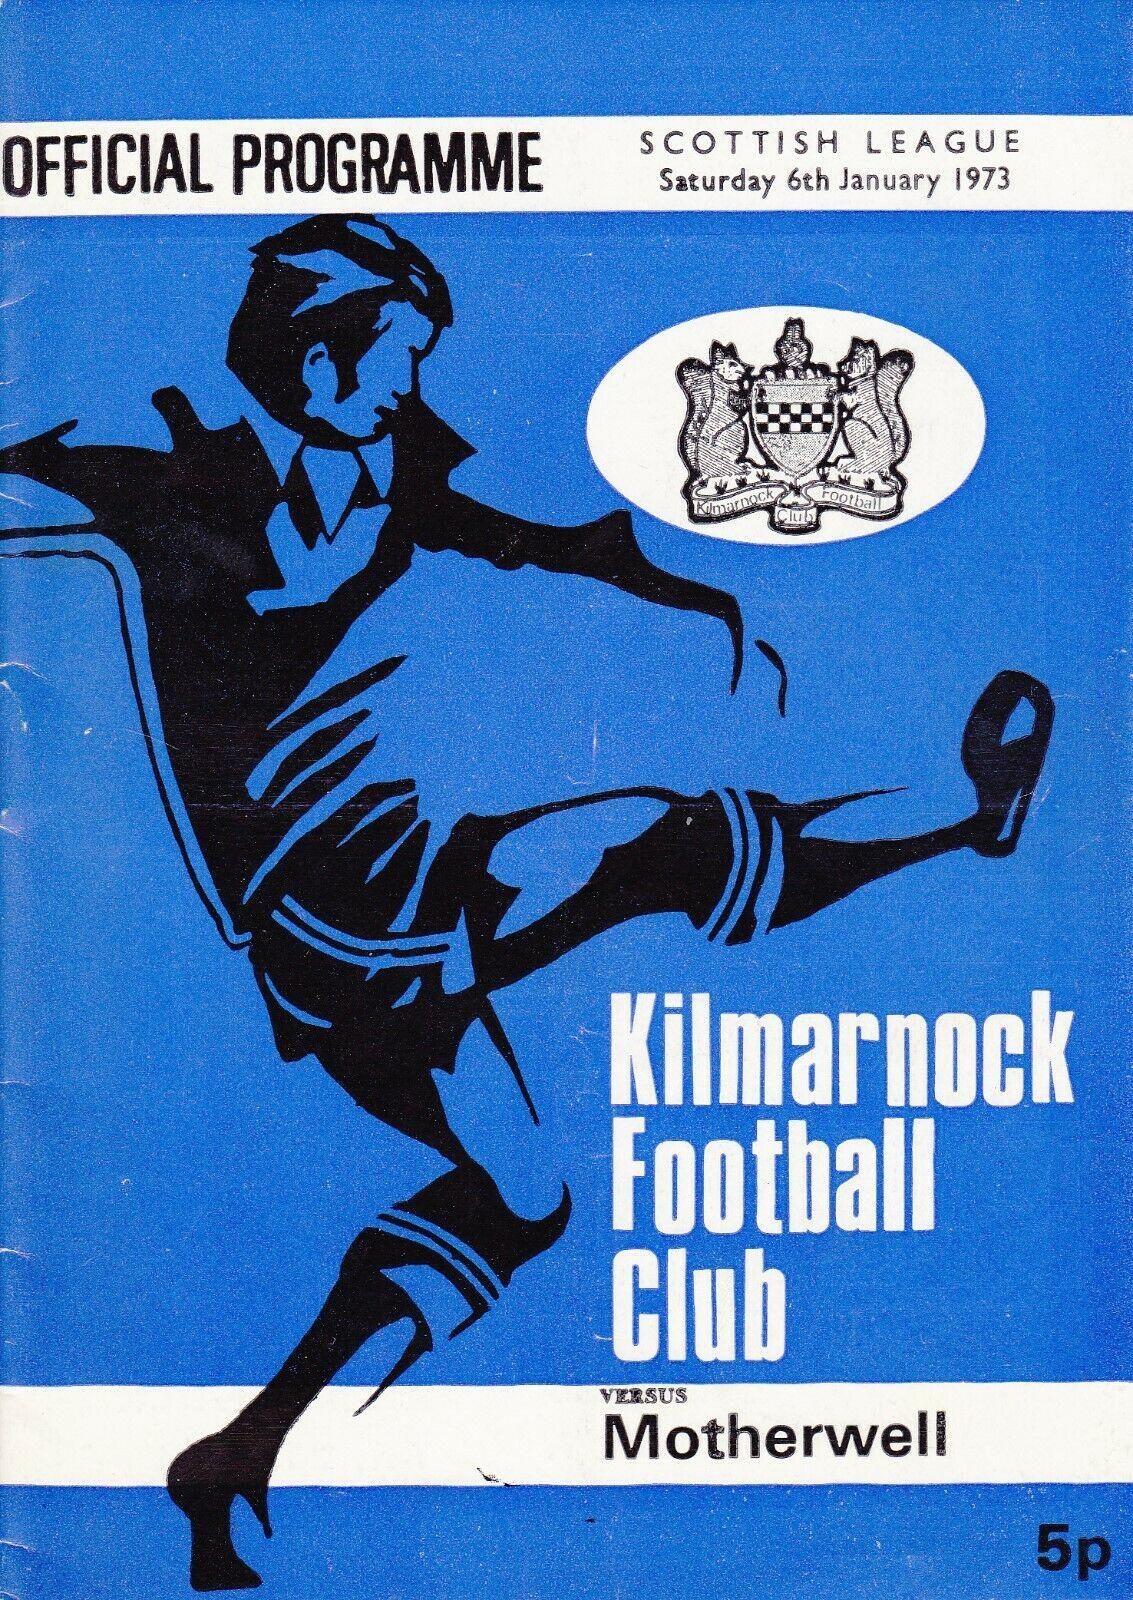 versus Kilmarnock Programme Cover